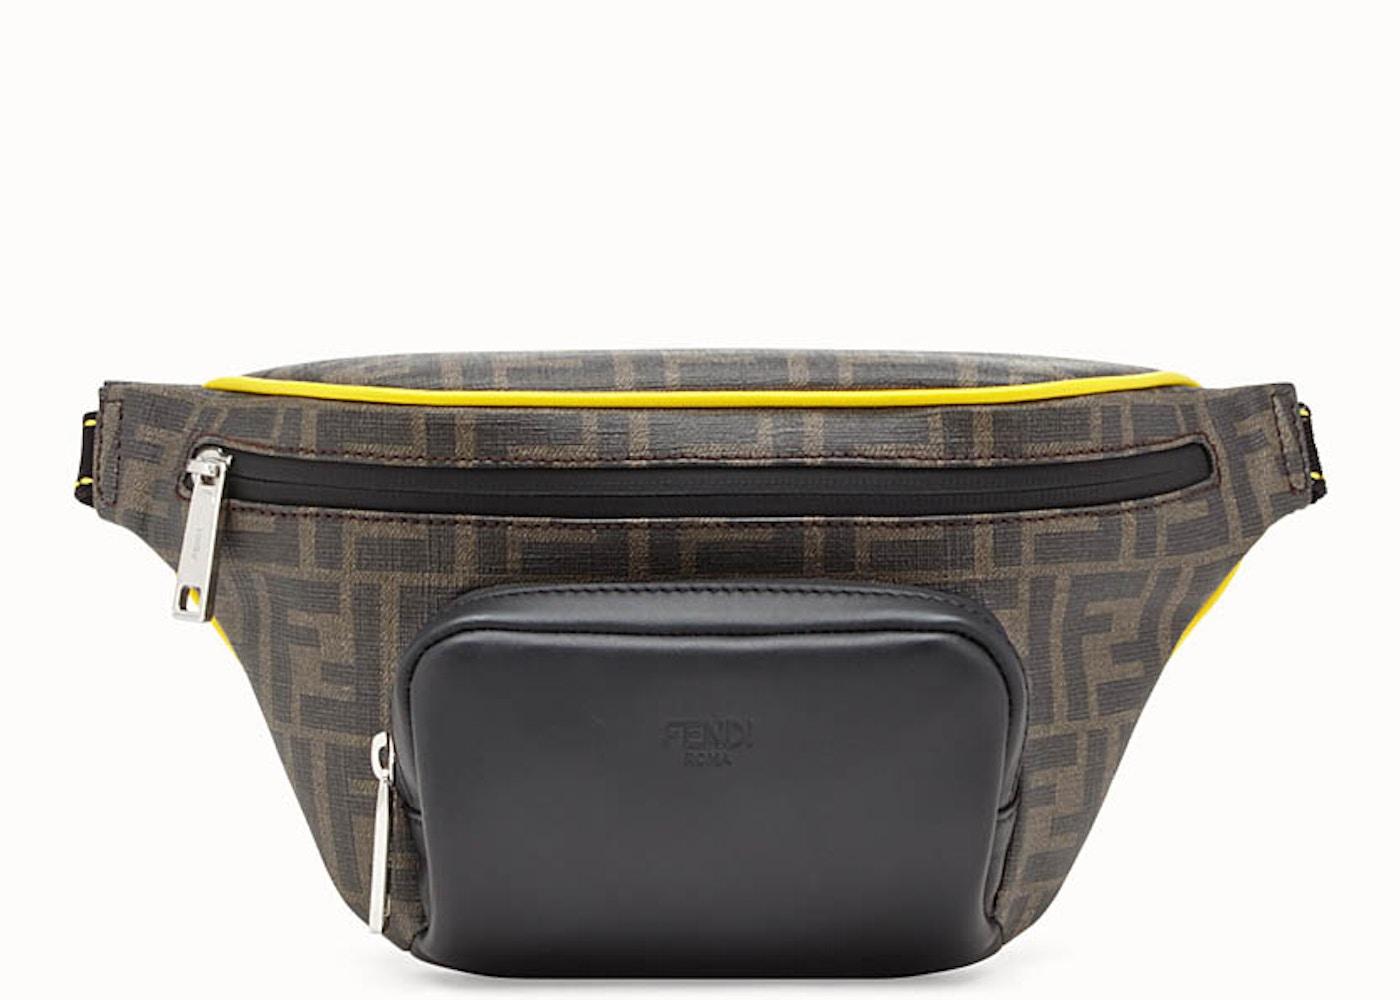 c2375a24 Fendi Belt Bag FF Fabric Yellow Piping Brown/Black